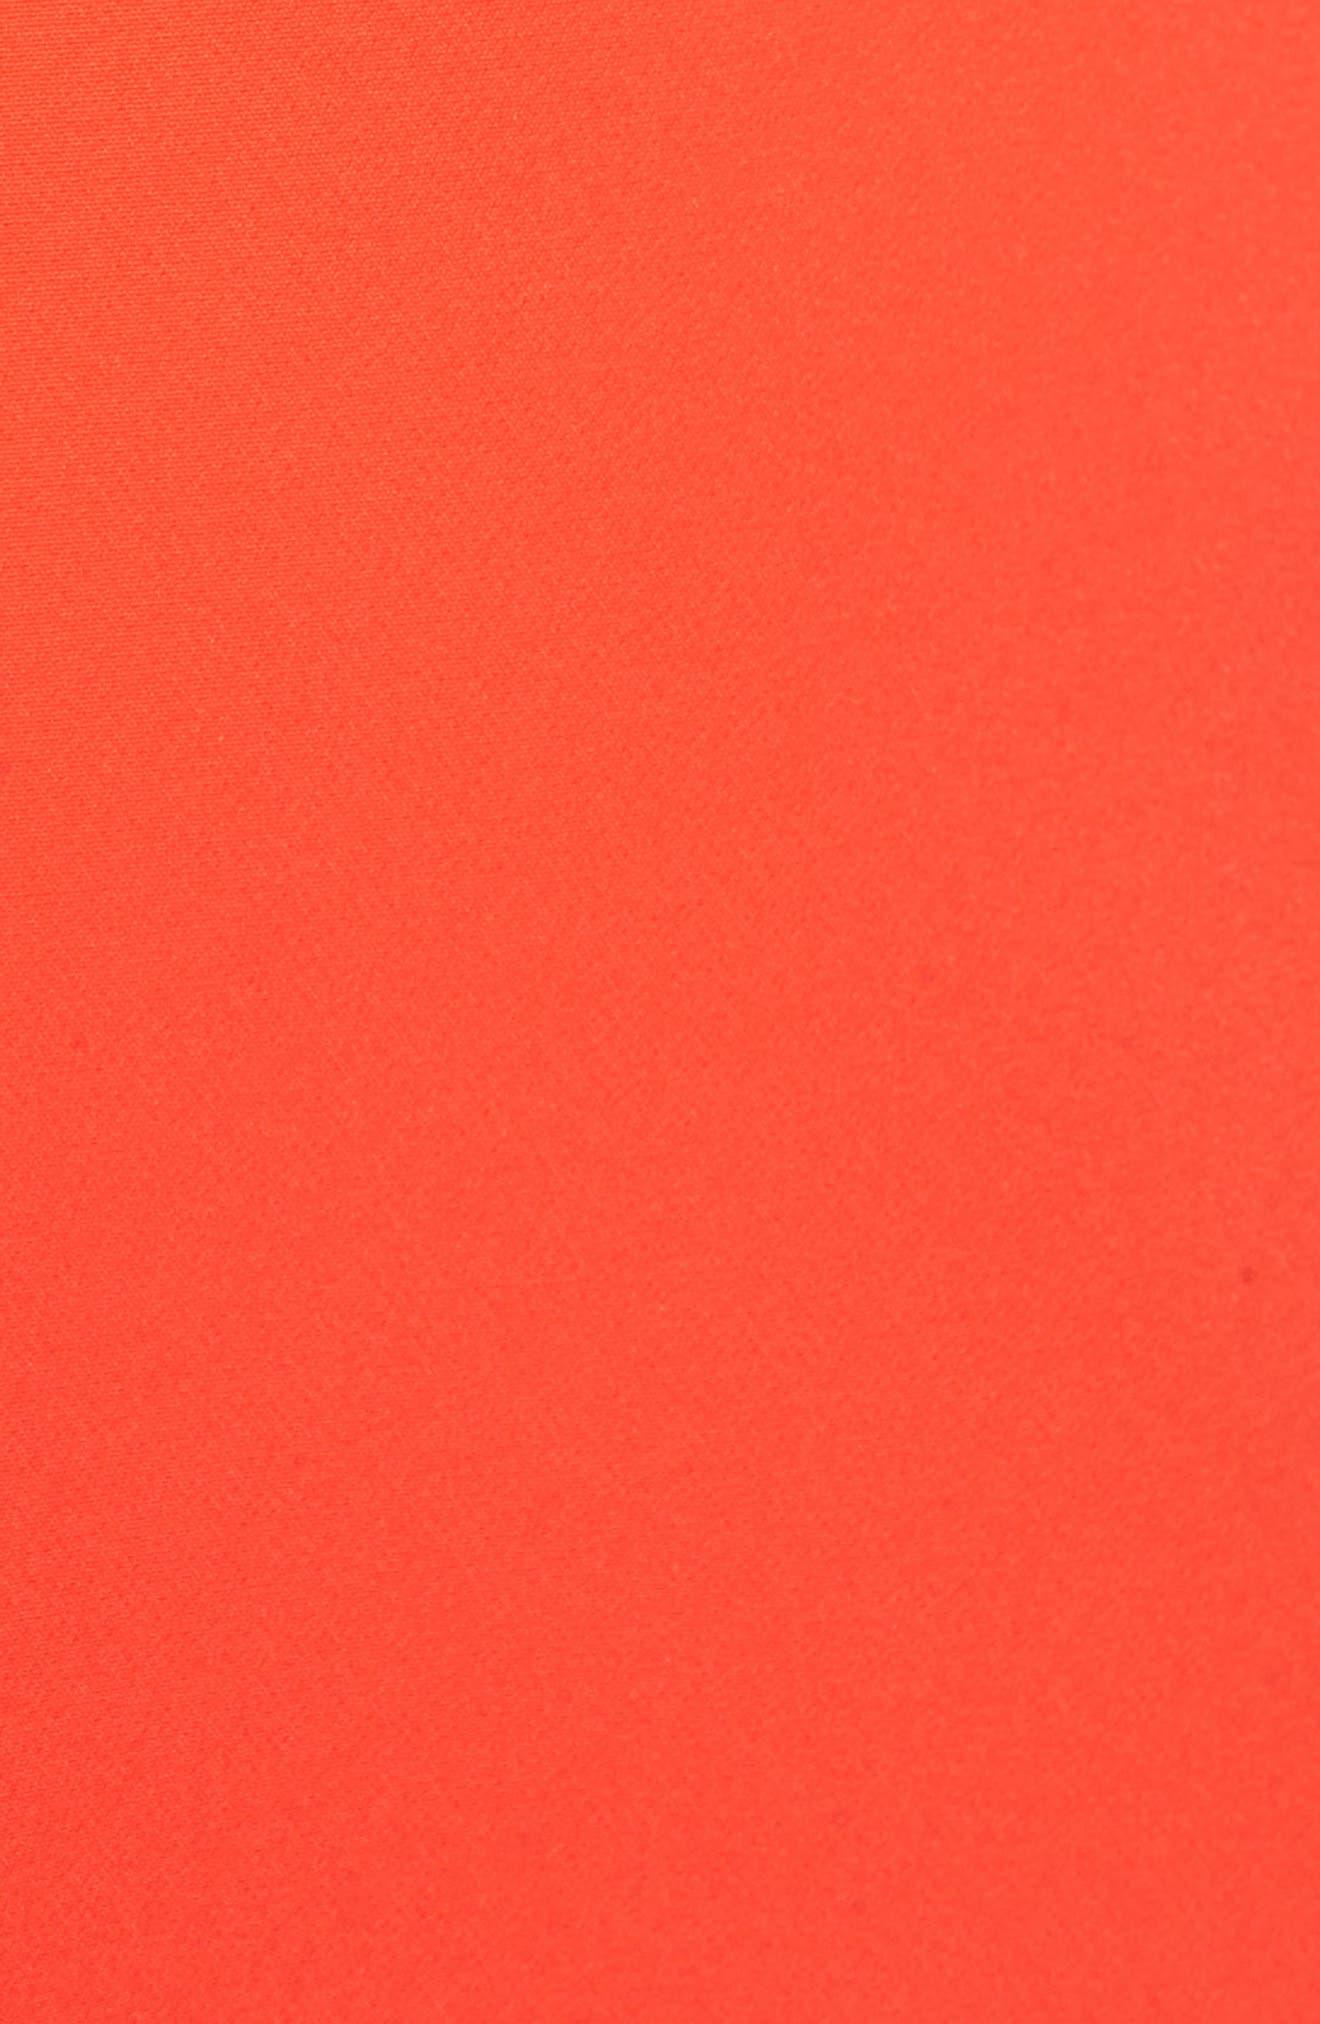 Laguna Ruffle Sheath Dress,                             Alternate thumbnail 6, color,                             Orange